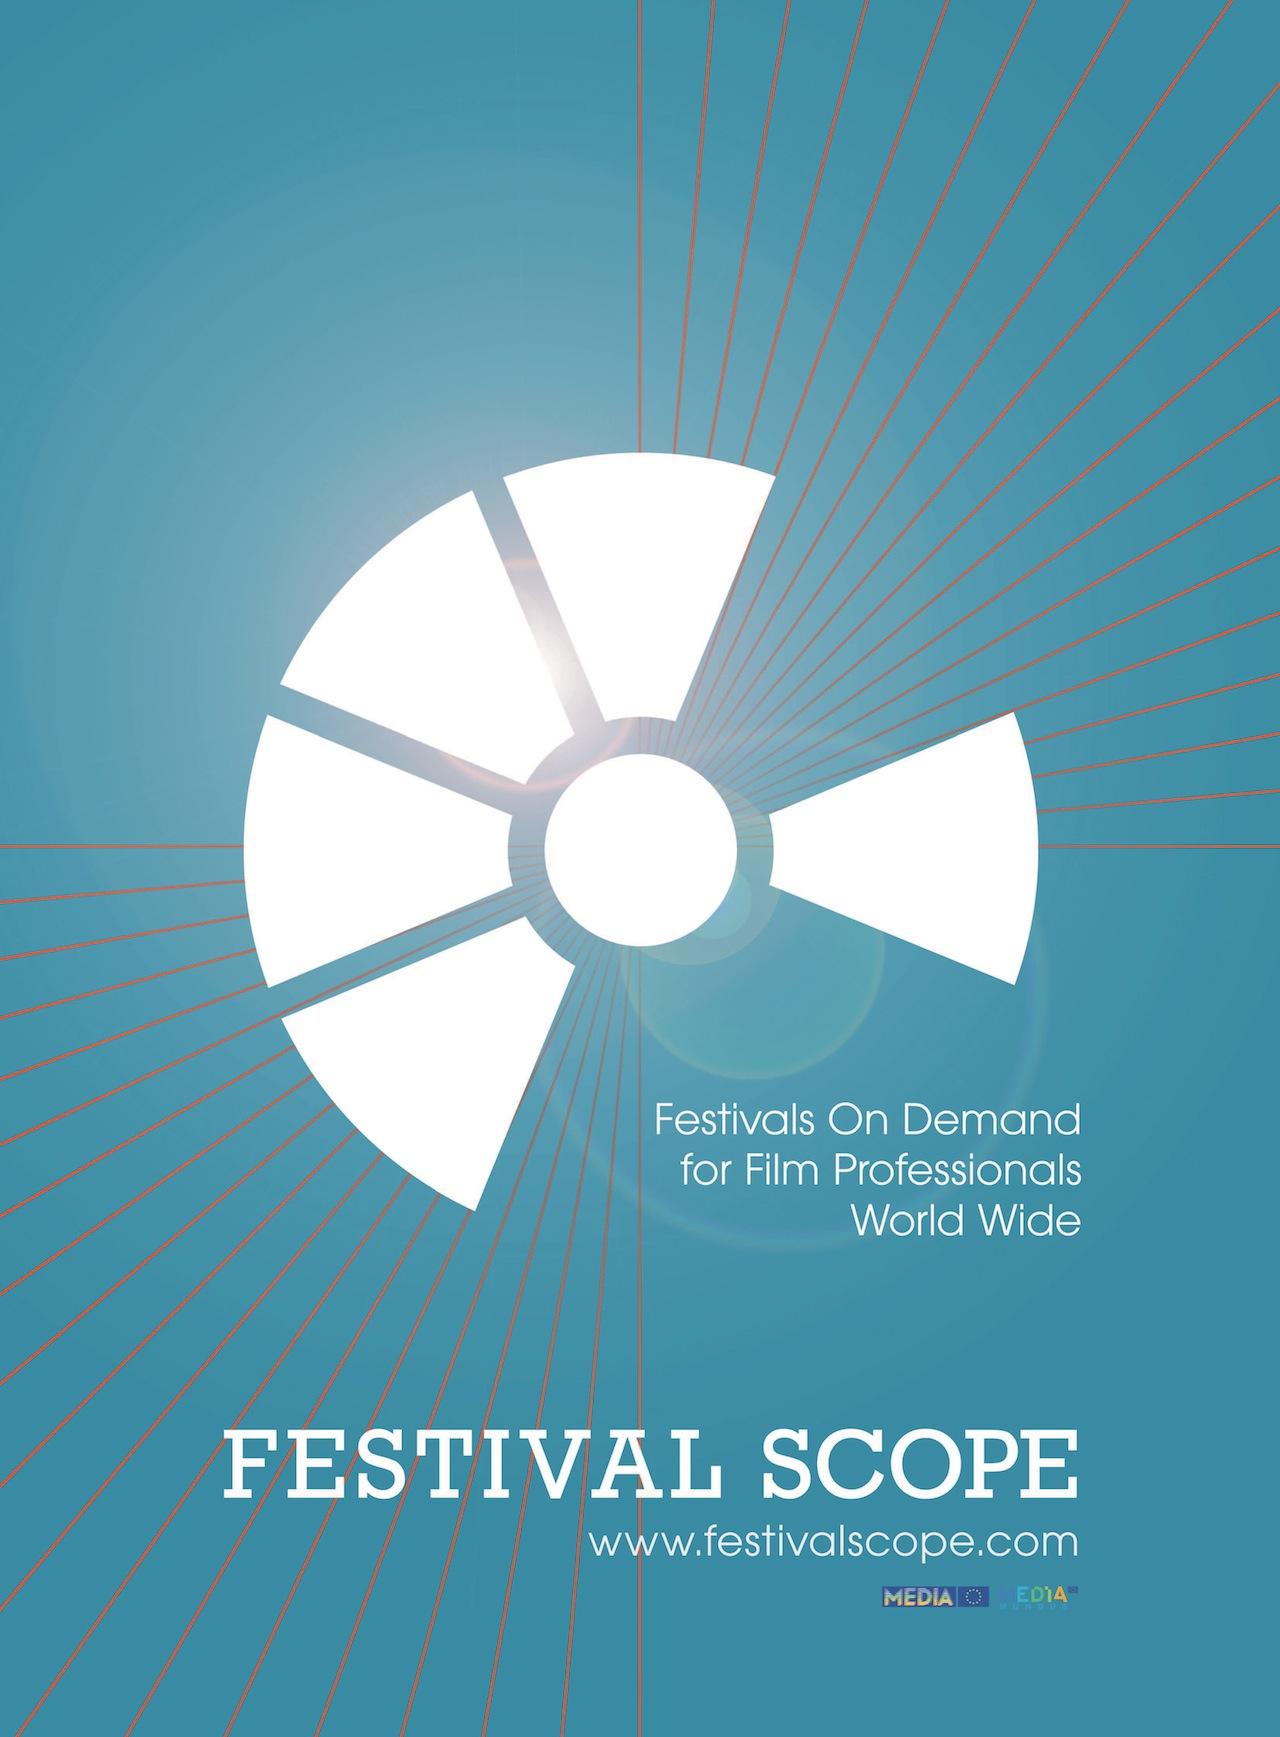 festivalscope